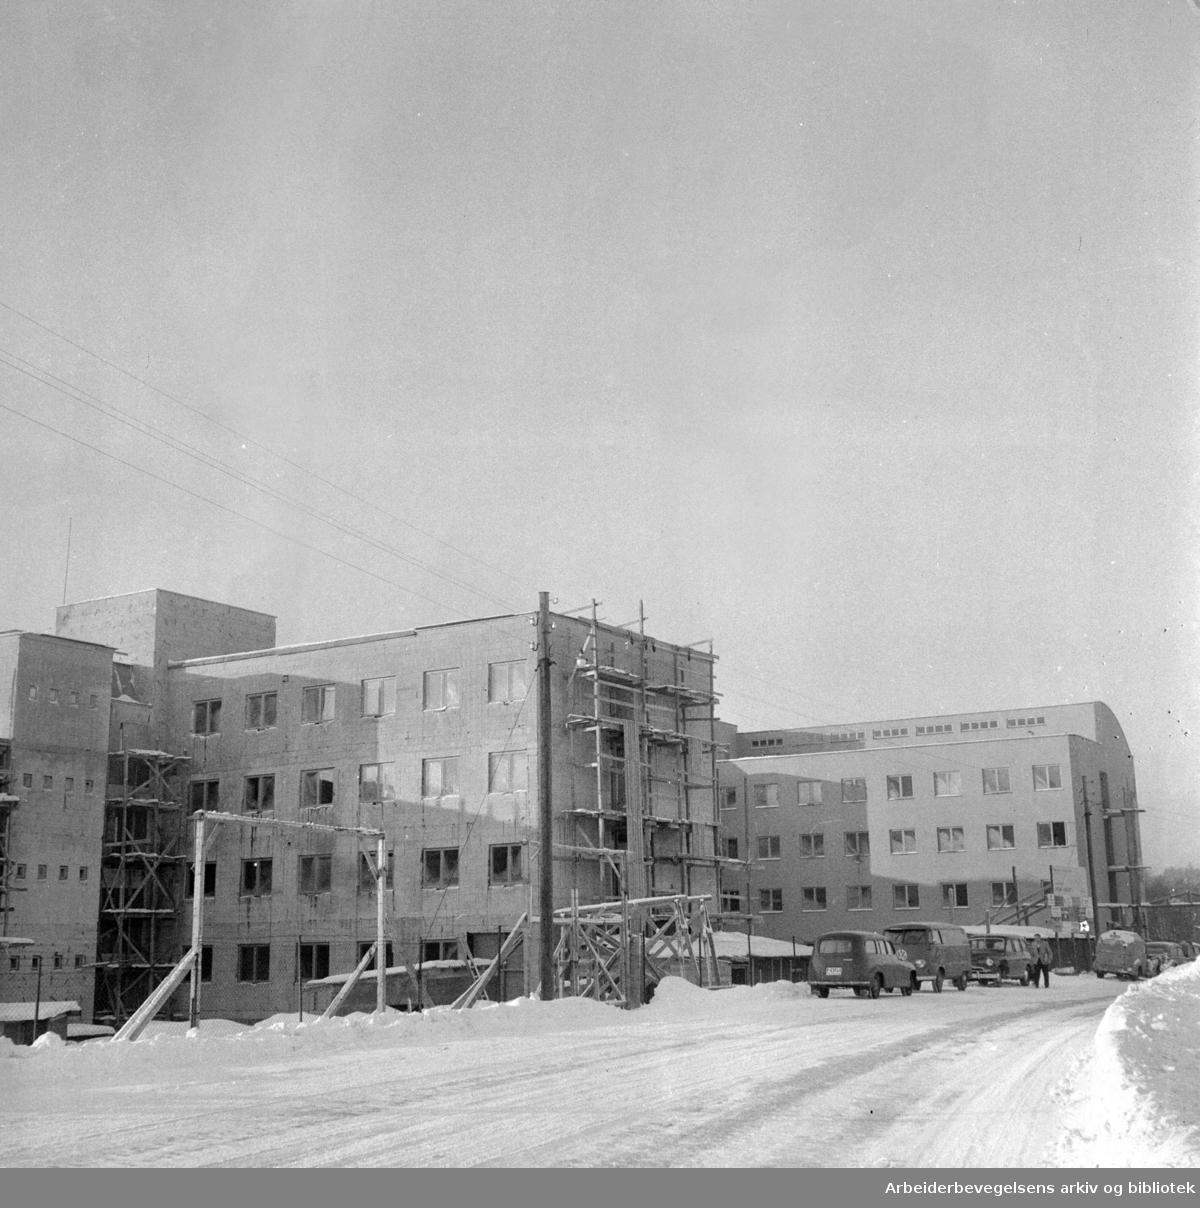 Papirindustriens forskningsinstitutt under bygging. Januar 1956